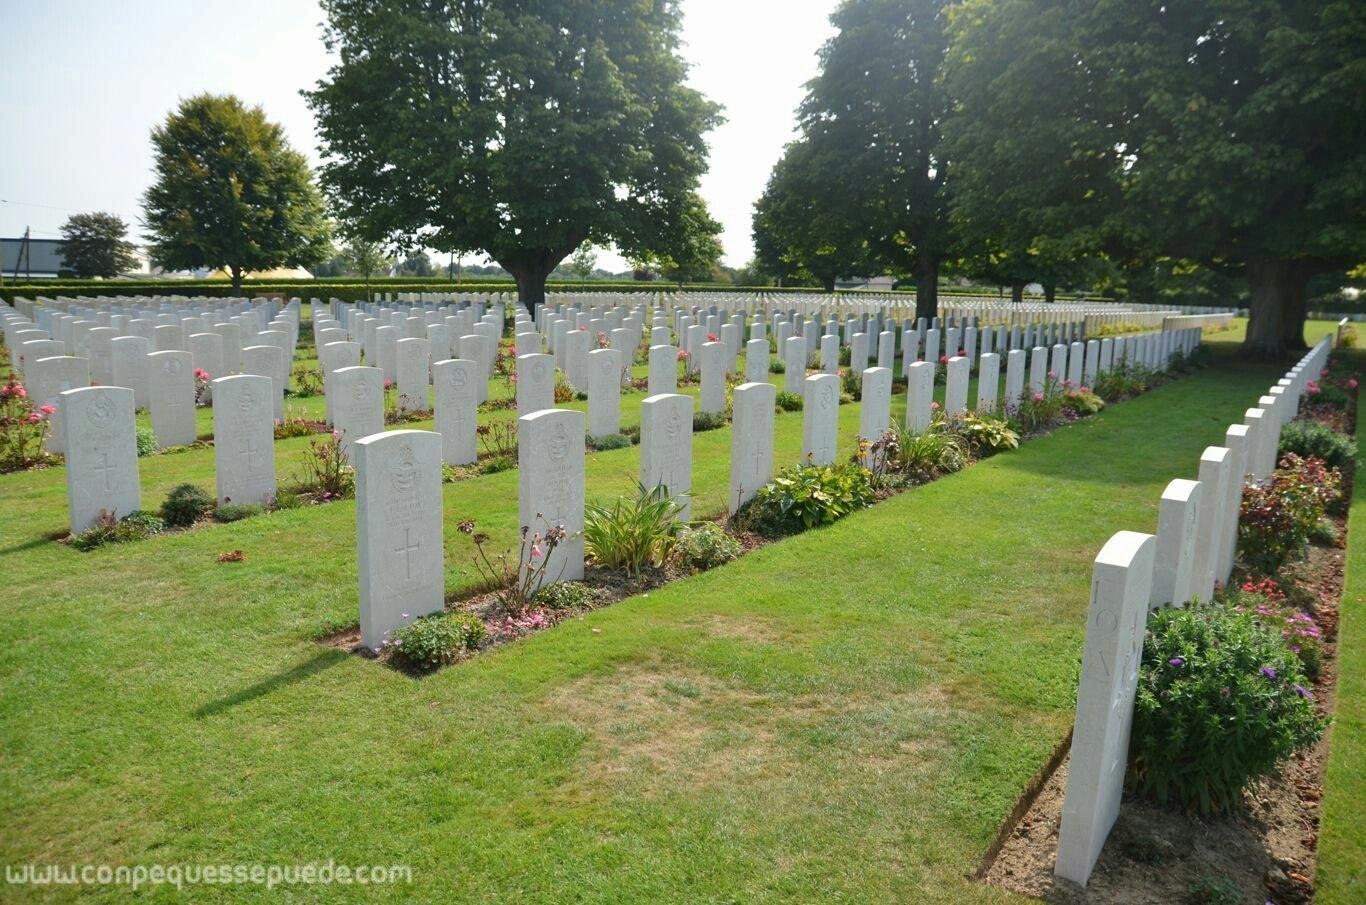 Tumbas en el cementerio británico de Bayeux